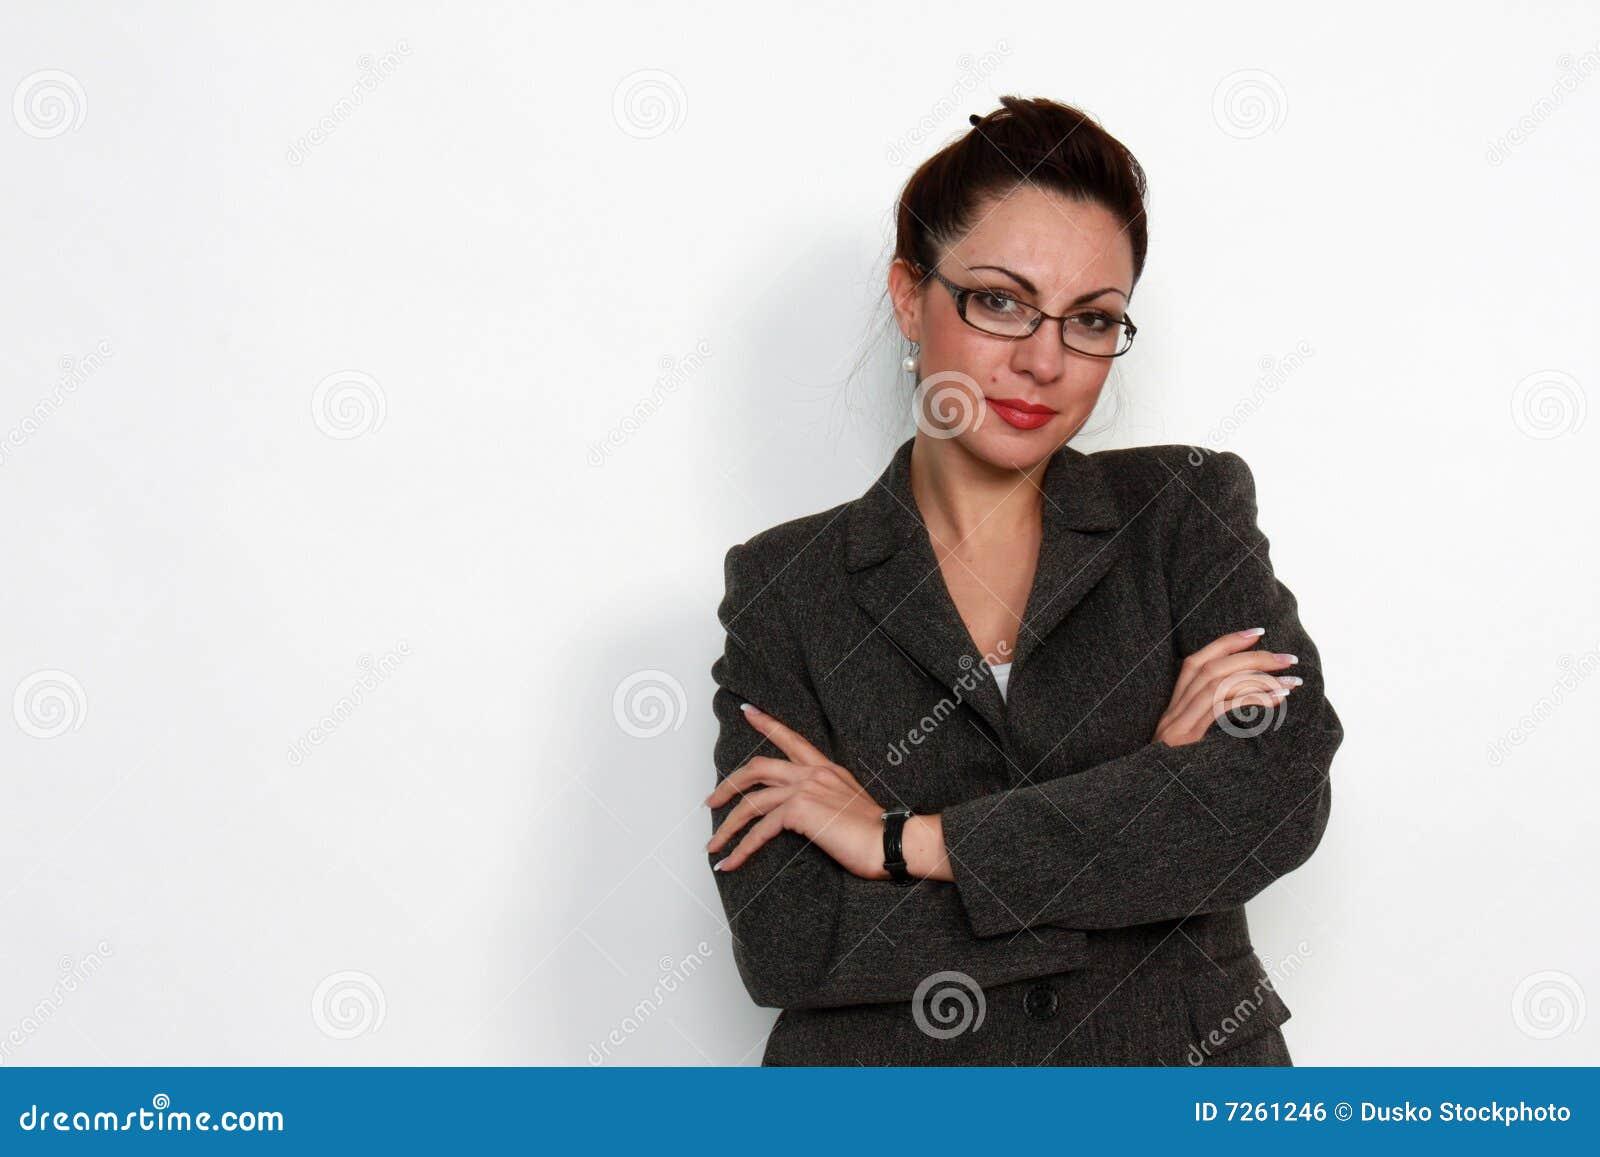 elegant woman with eyeglasses